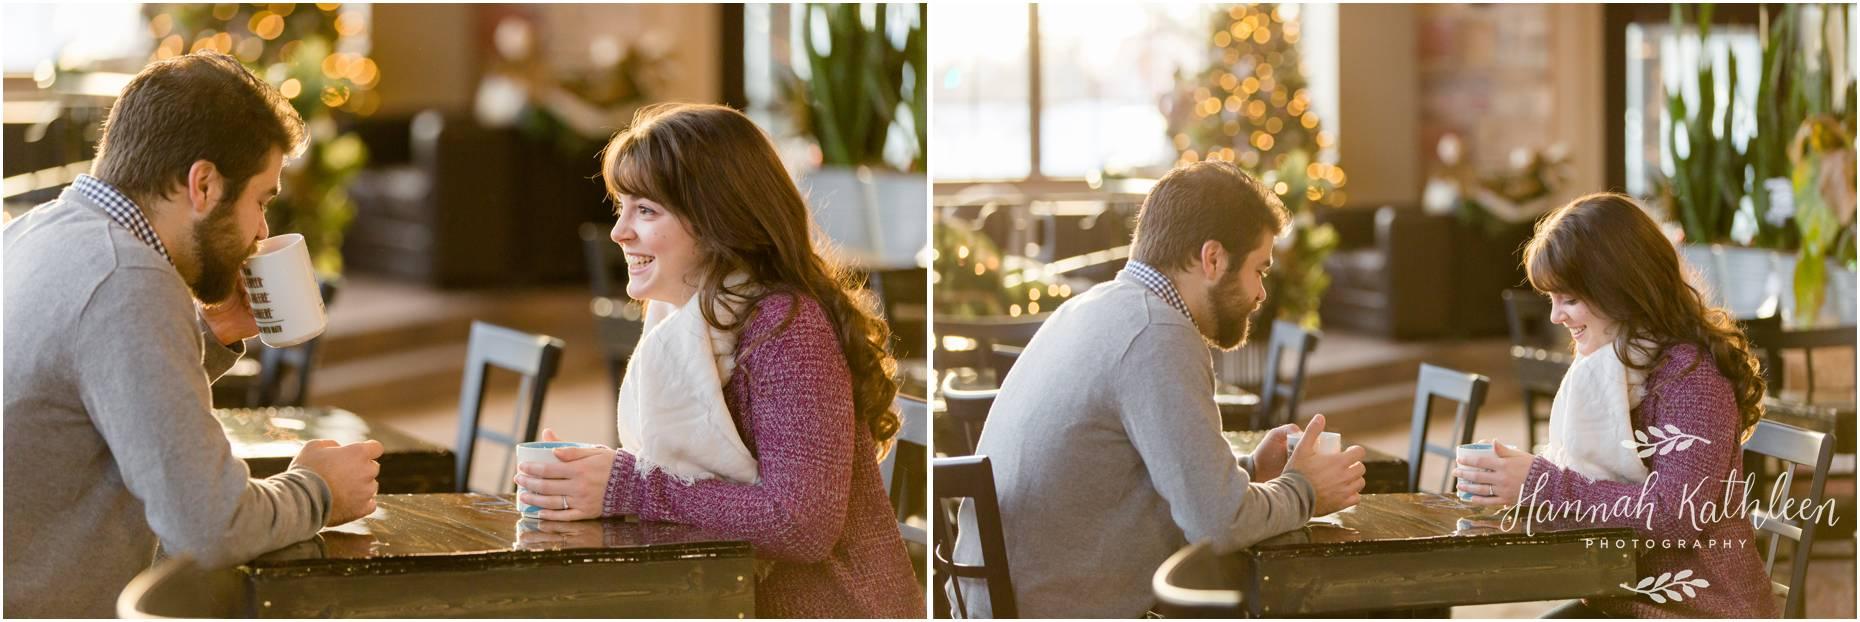 Coffee_Shop_Engagement_Session_Luke_Eva